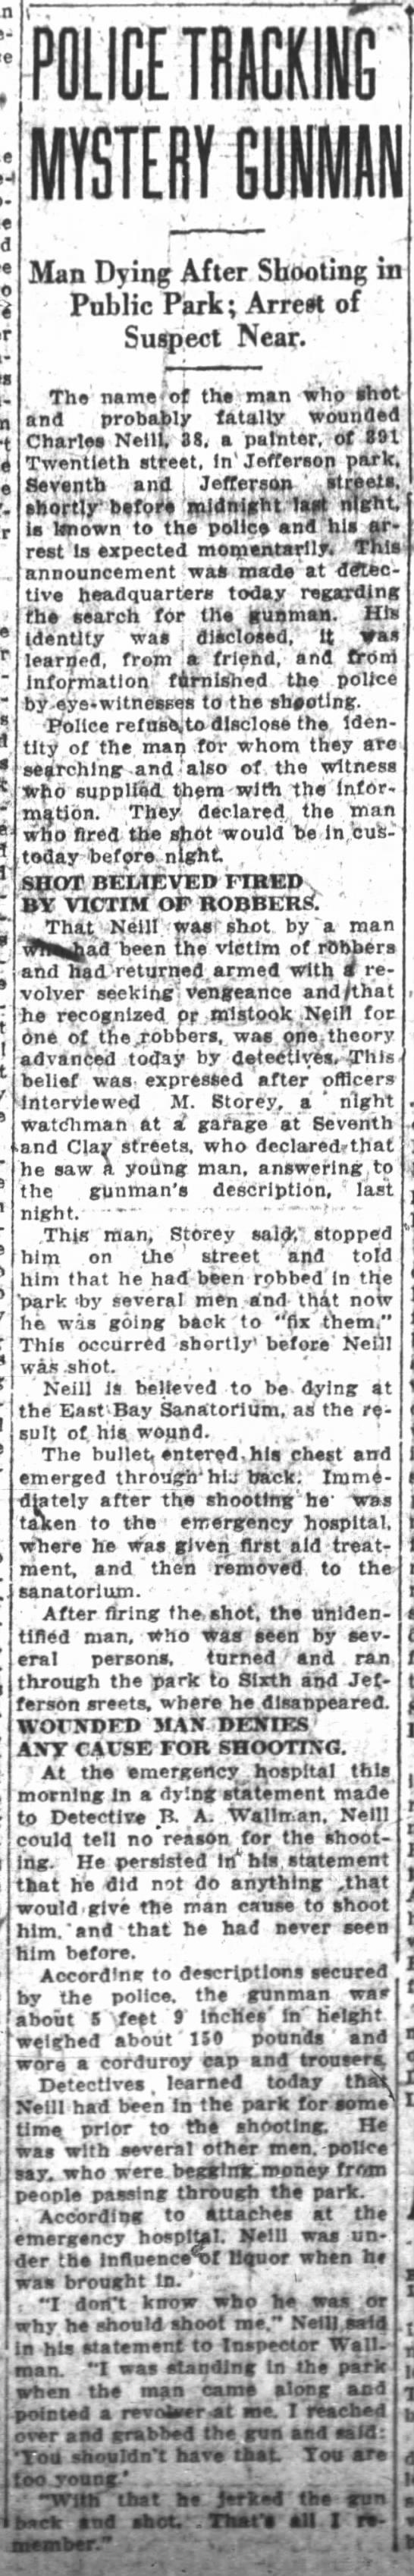 mystery gunman -